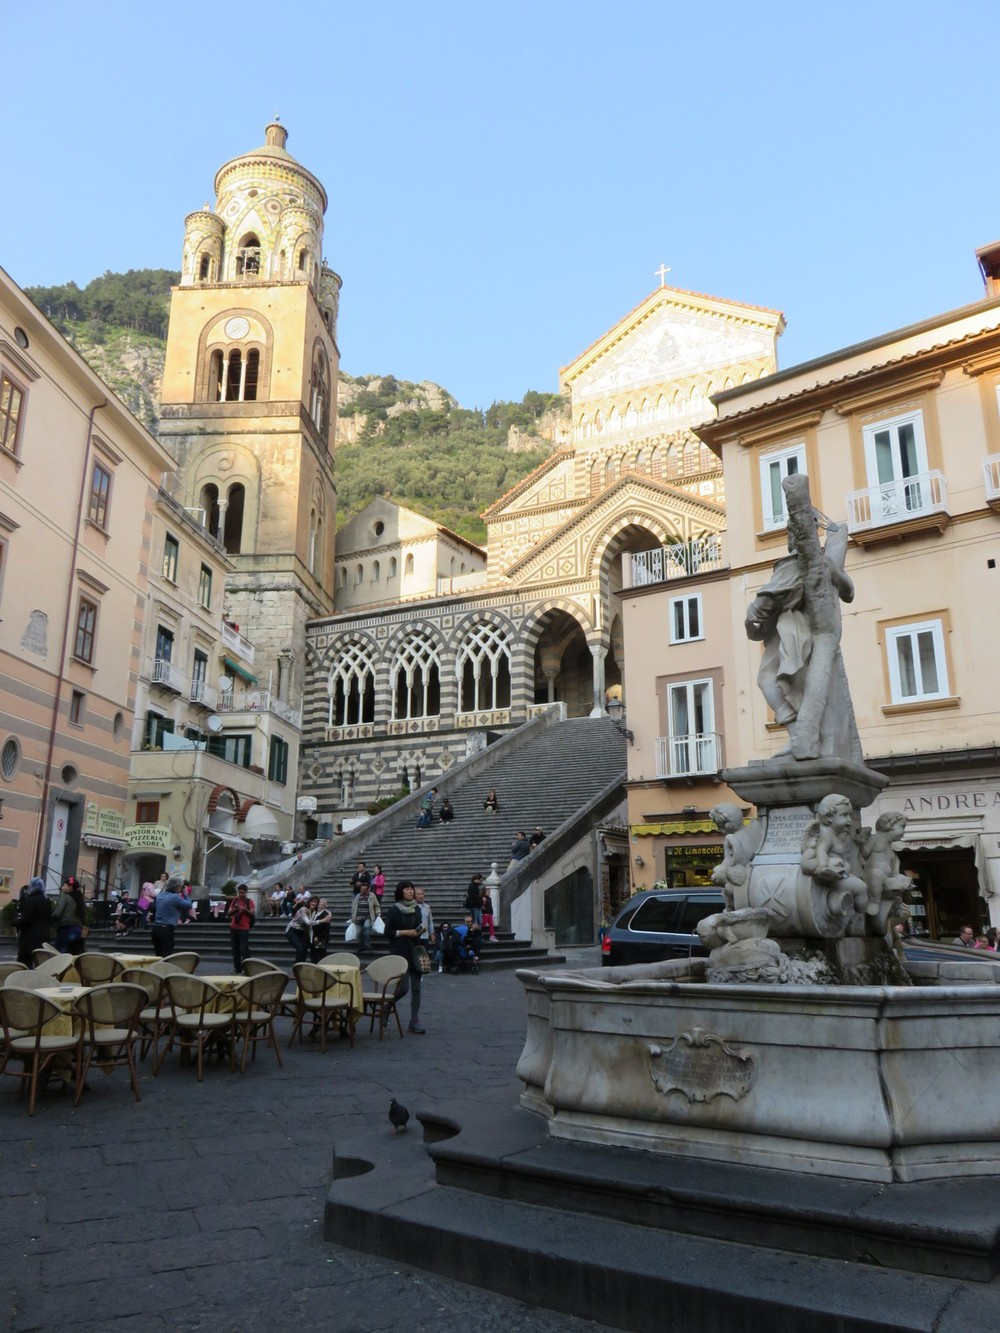 The beautiful Amalfi church and piazza